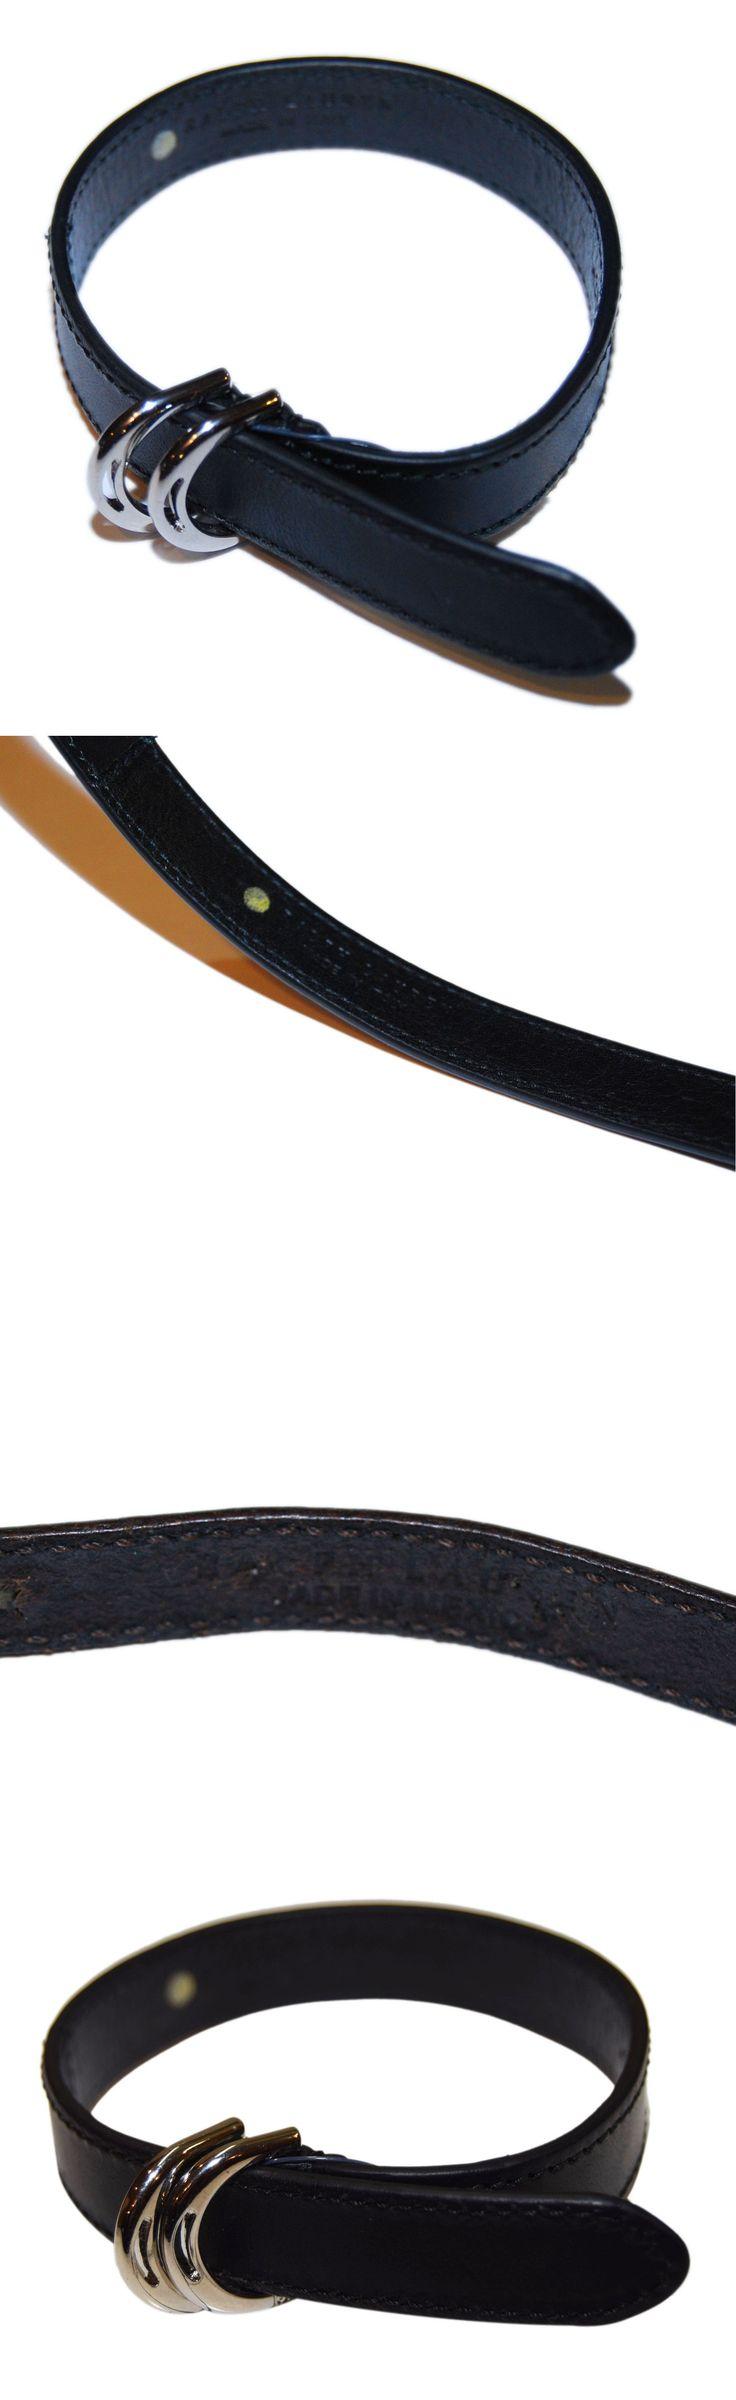 Wristbands 106129: Polo Ralph Lauren Women Equestrian Leather Horseshoe Bracelet Black Silver Italy -> BUY IT NOW ONLY: $159.2 on eBay!